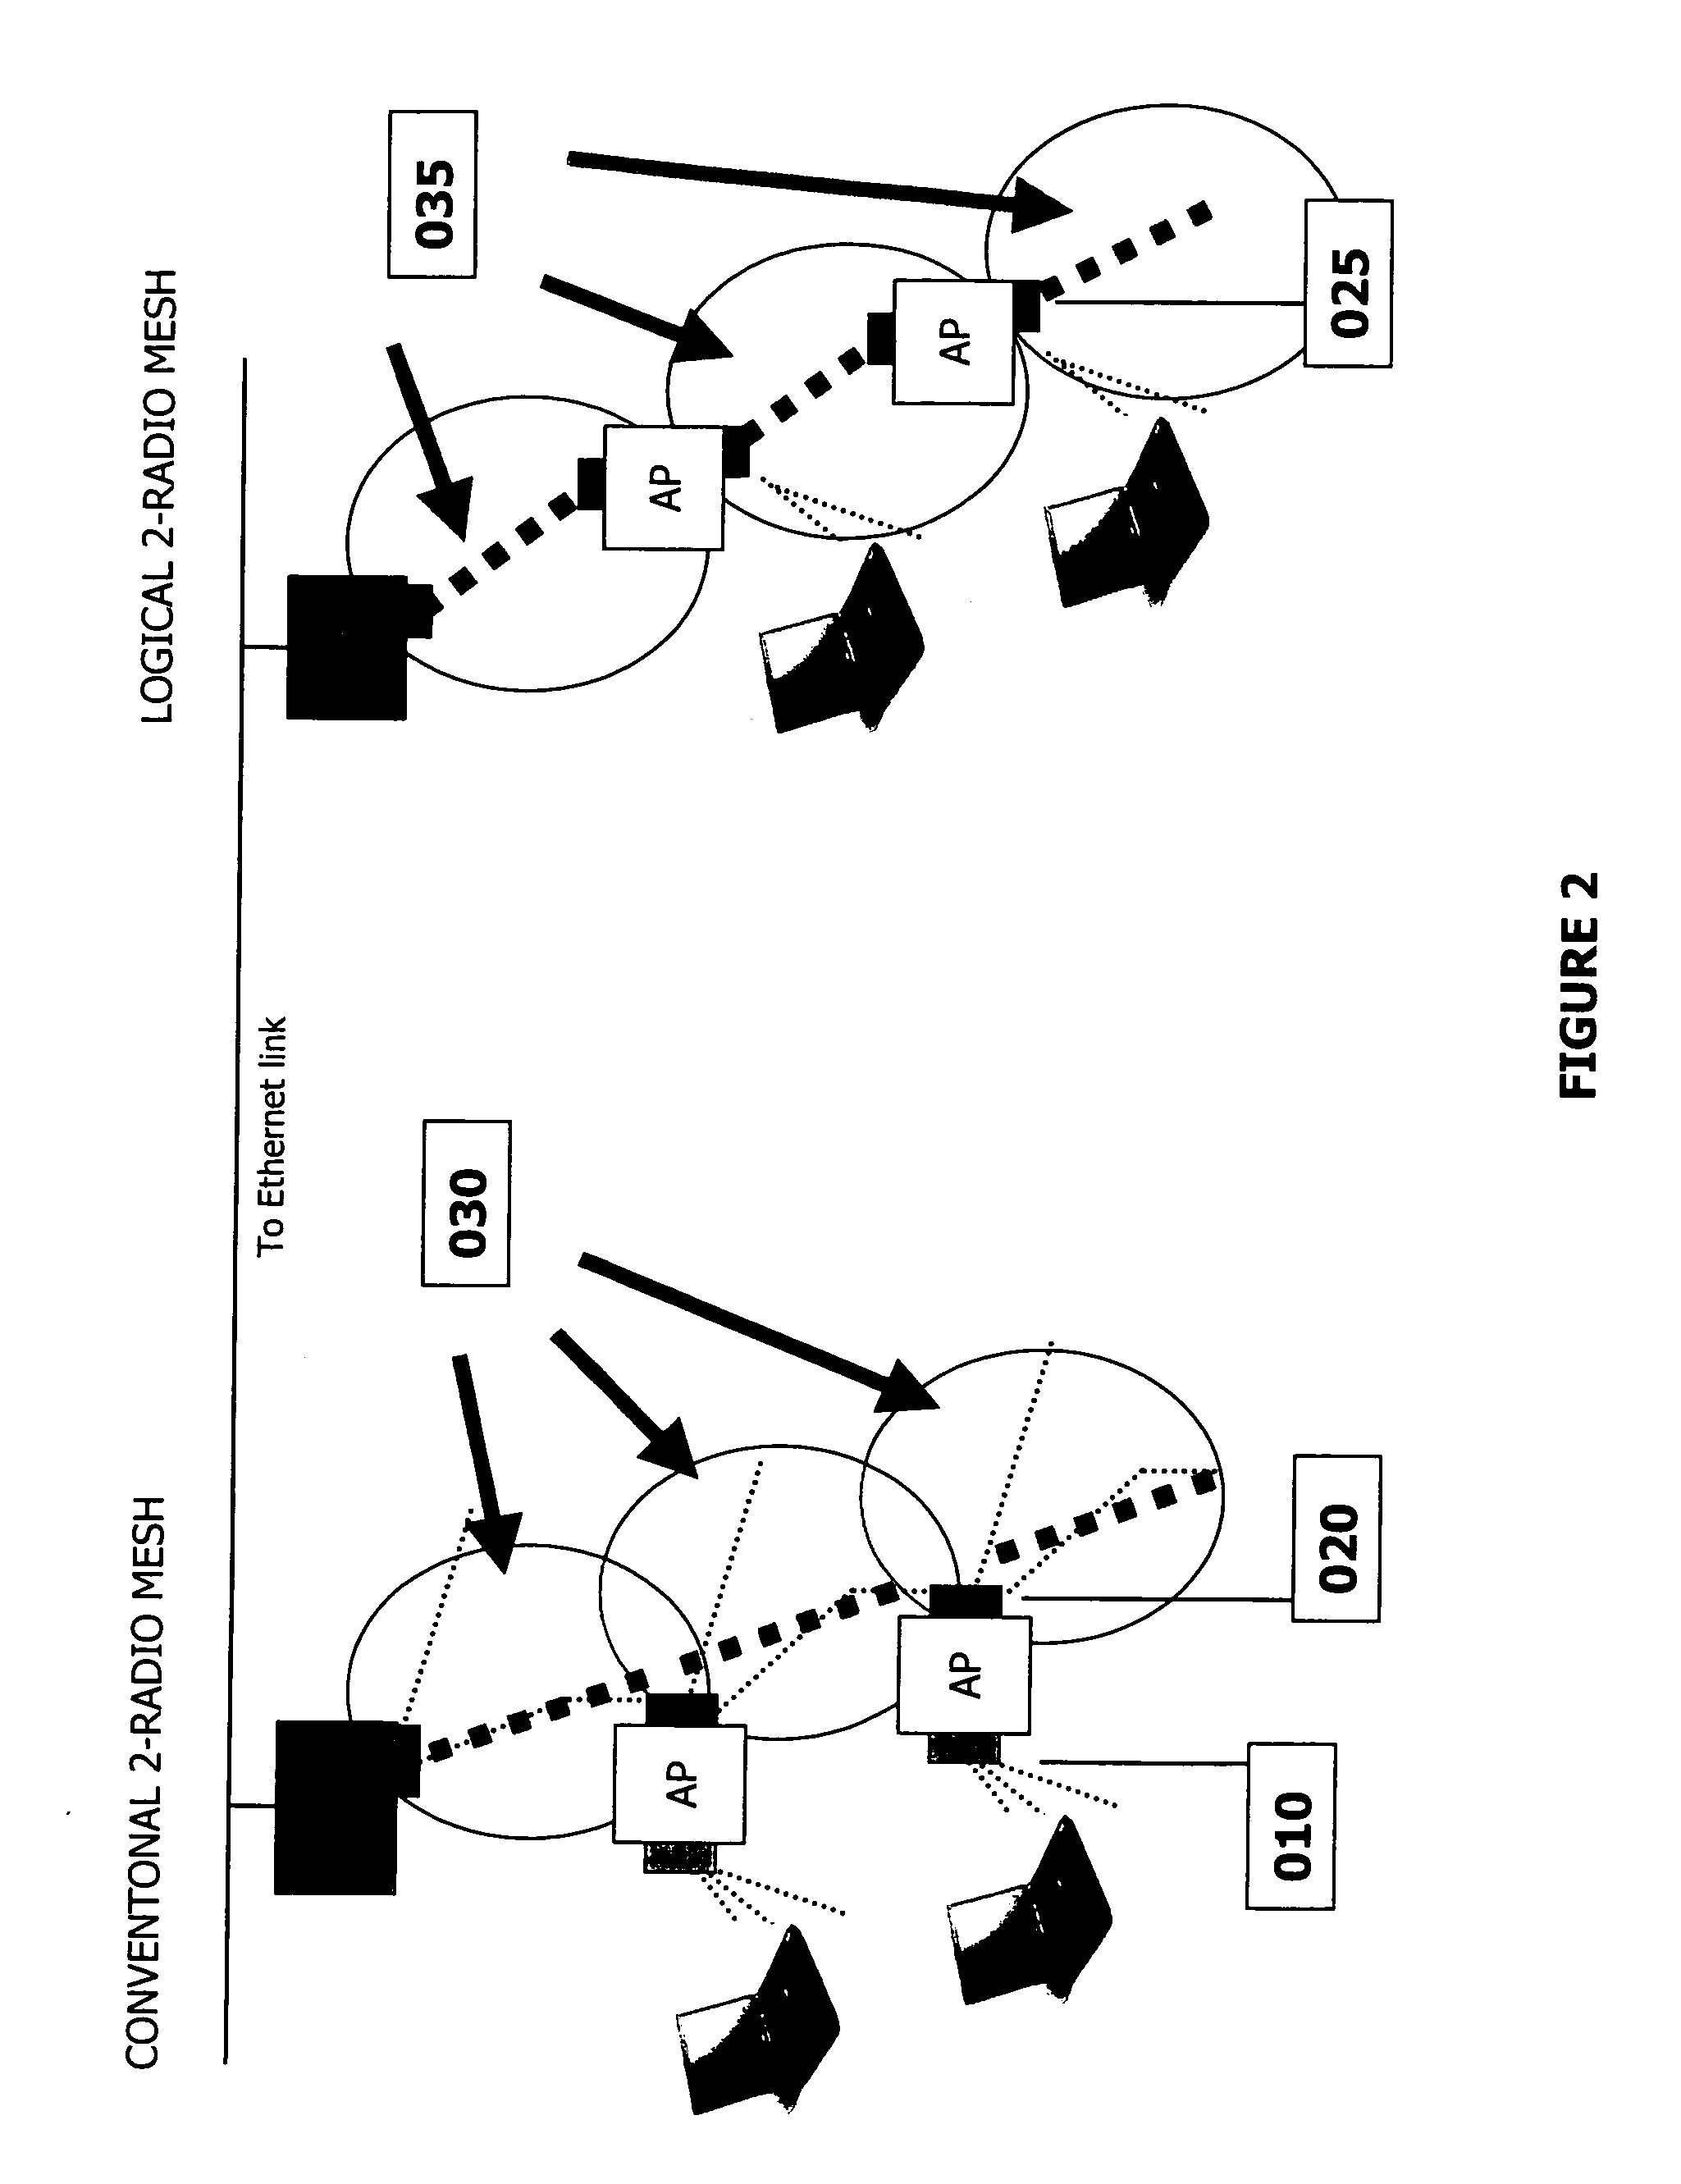 critical response to yan rado and The orphan nuclear receptor nur77 plays critical orphan nuclear receptor nur77 inhibits cardiac receptor nur77 inhibits cardiac hypertrophic response to.